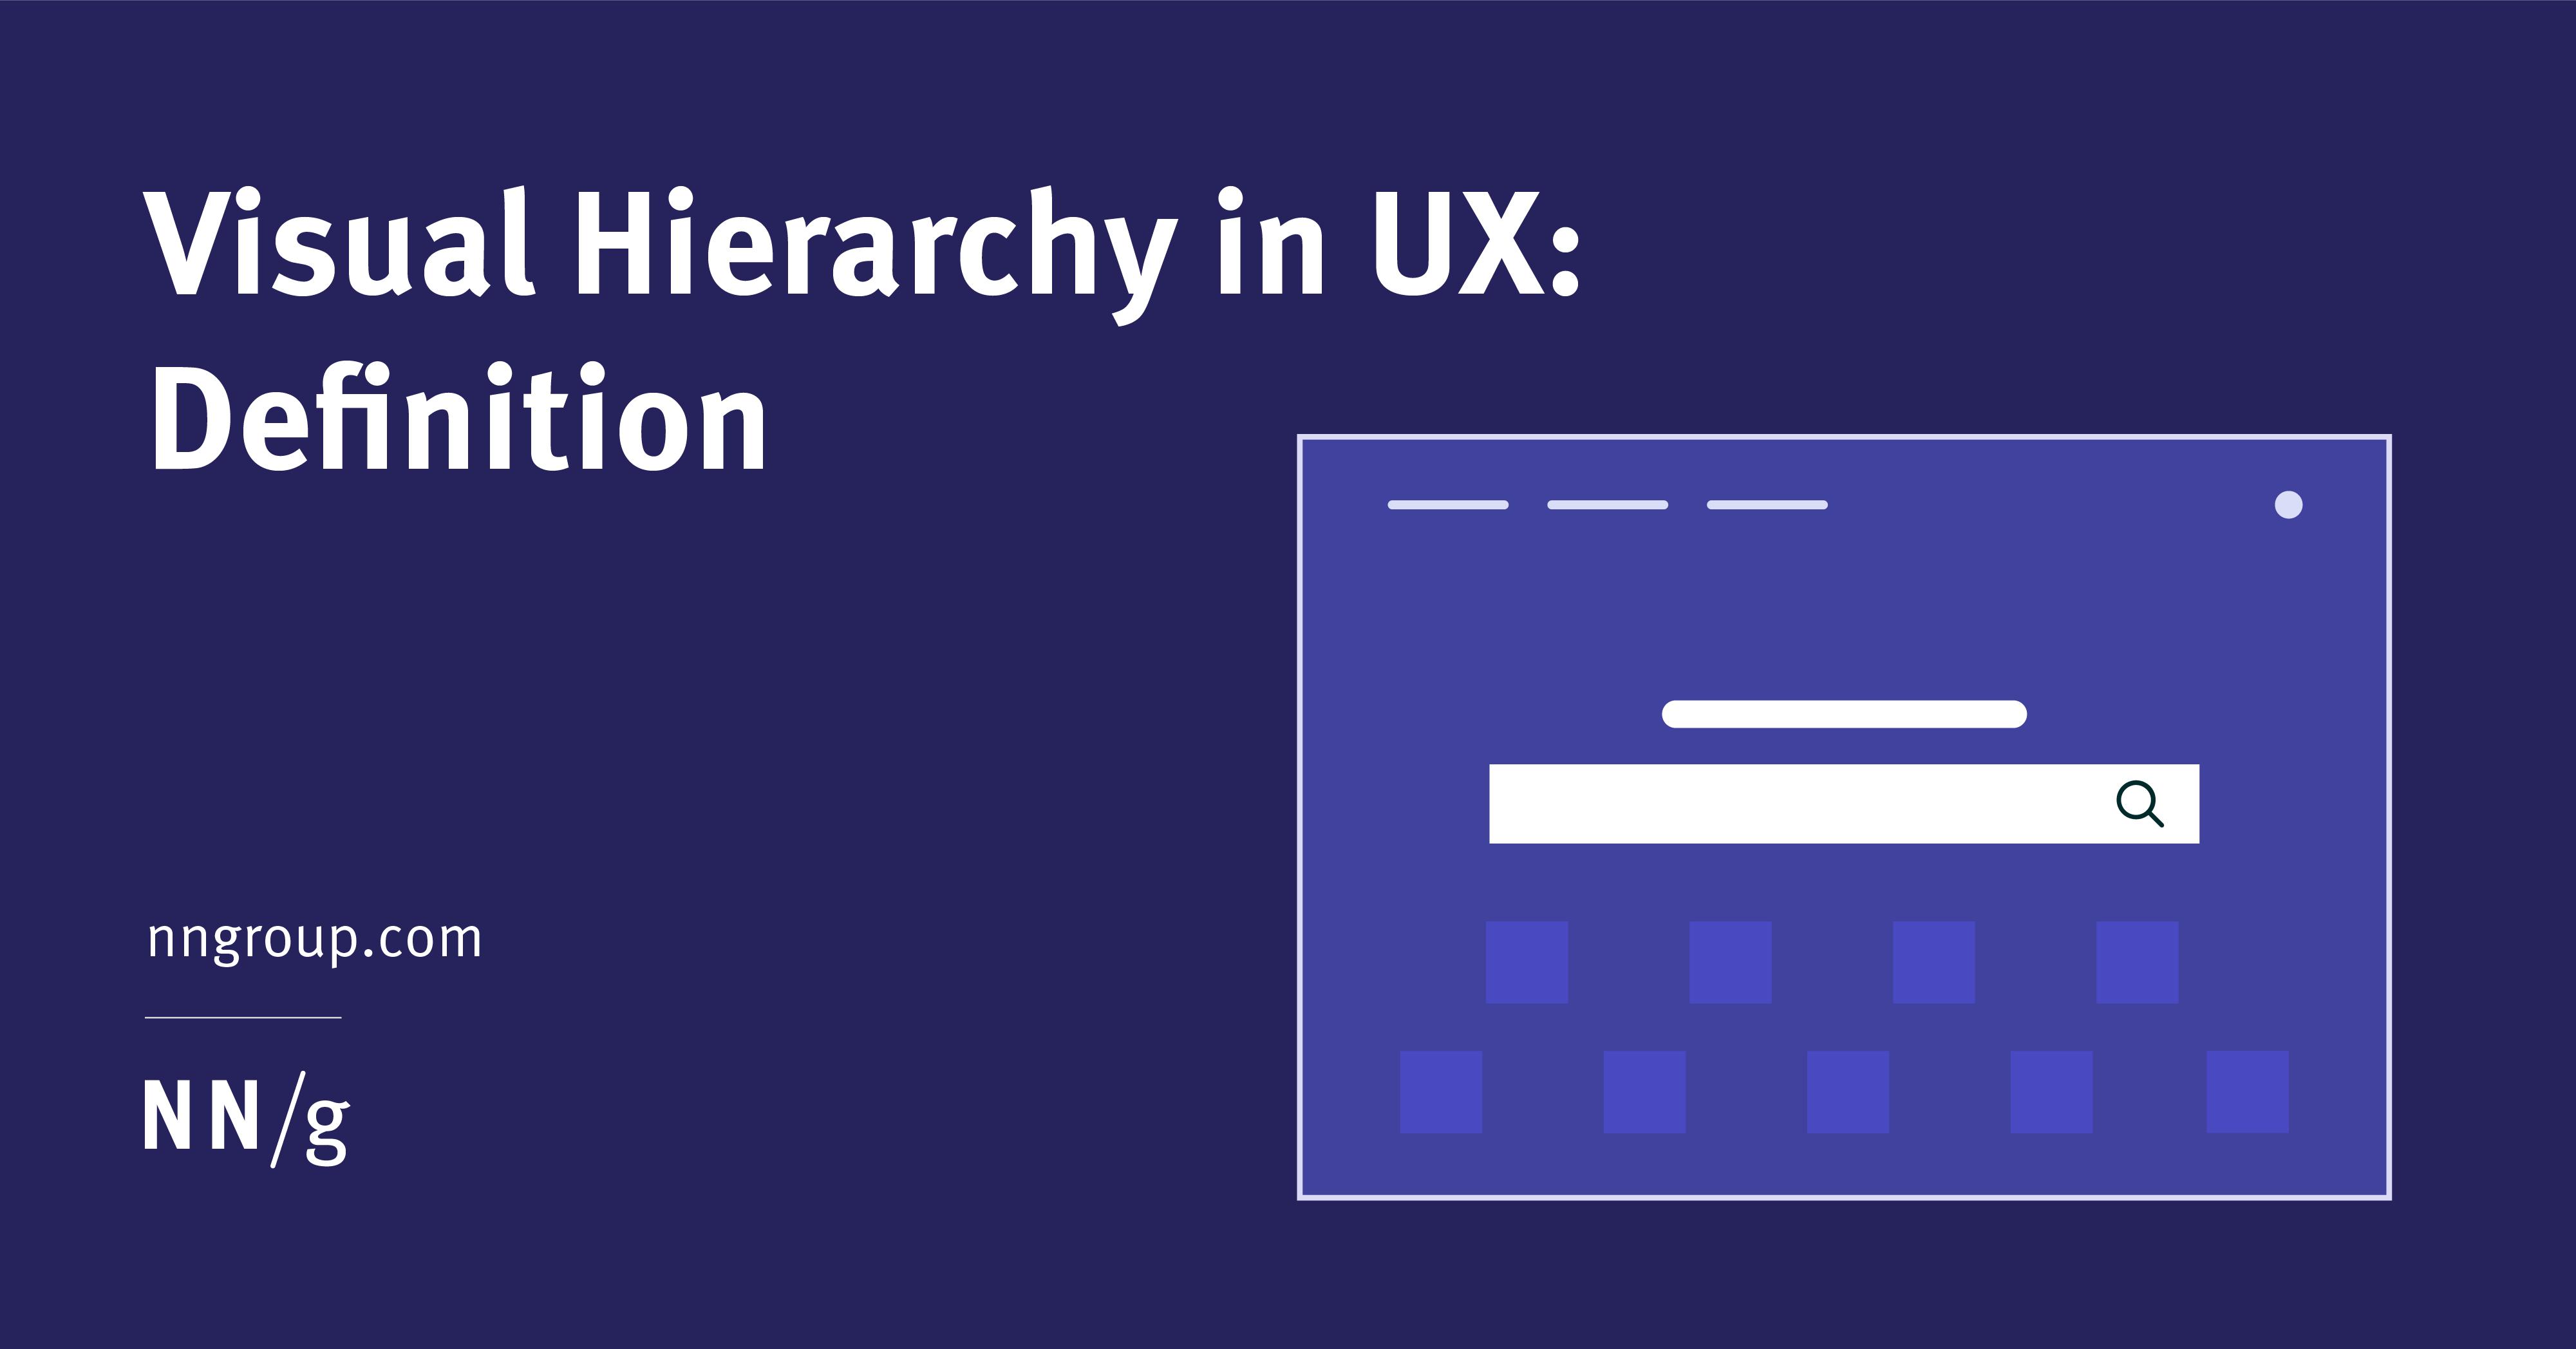 Visual Hierarchy in UX: Definition